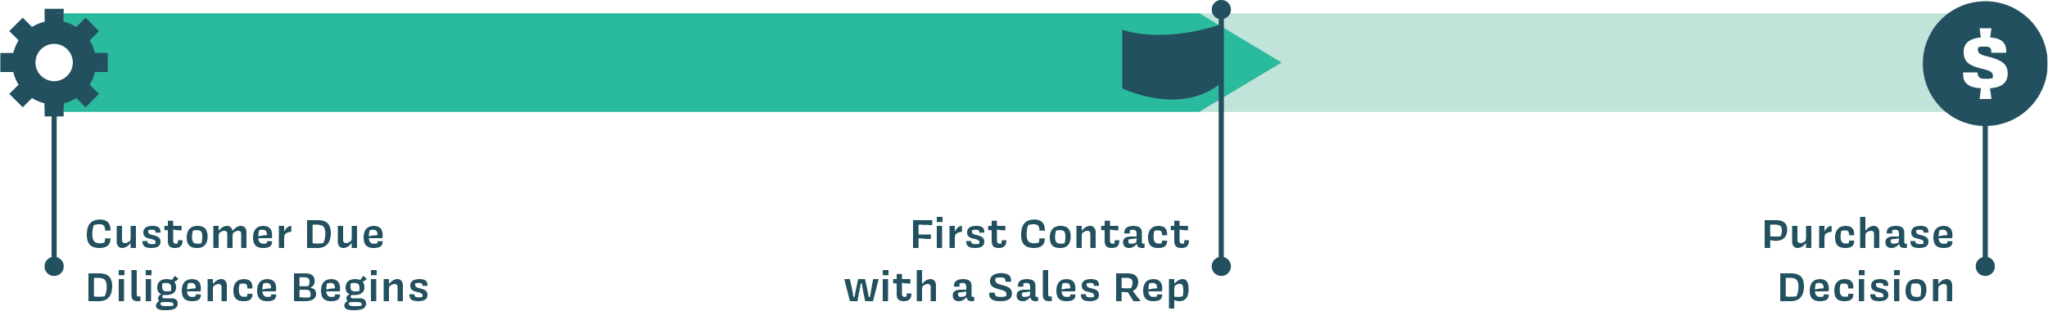 Buyers journey, journey, assessment, consideration, decision, buyer, B2B buyer